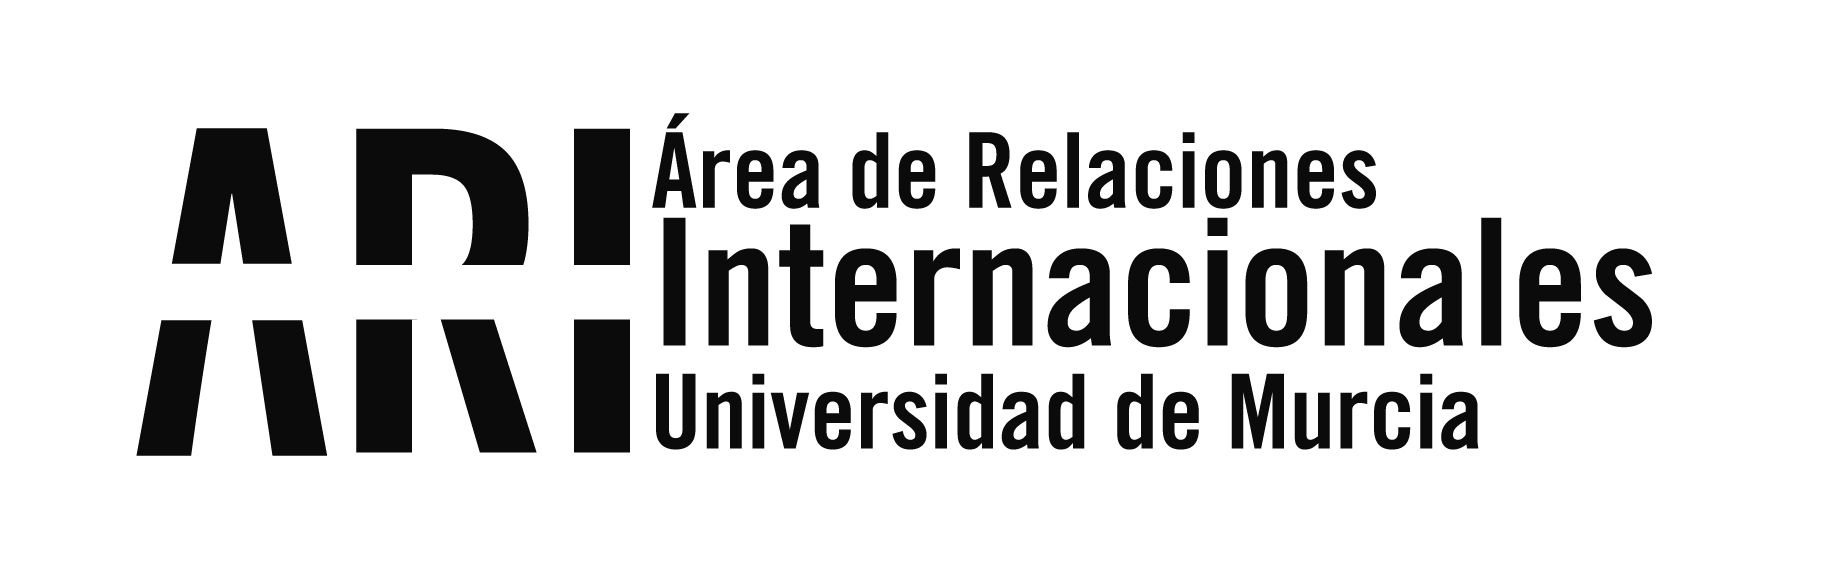 Reactivación de plazos administrativos en Internacionalización